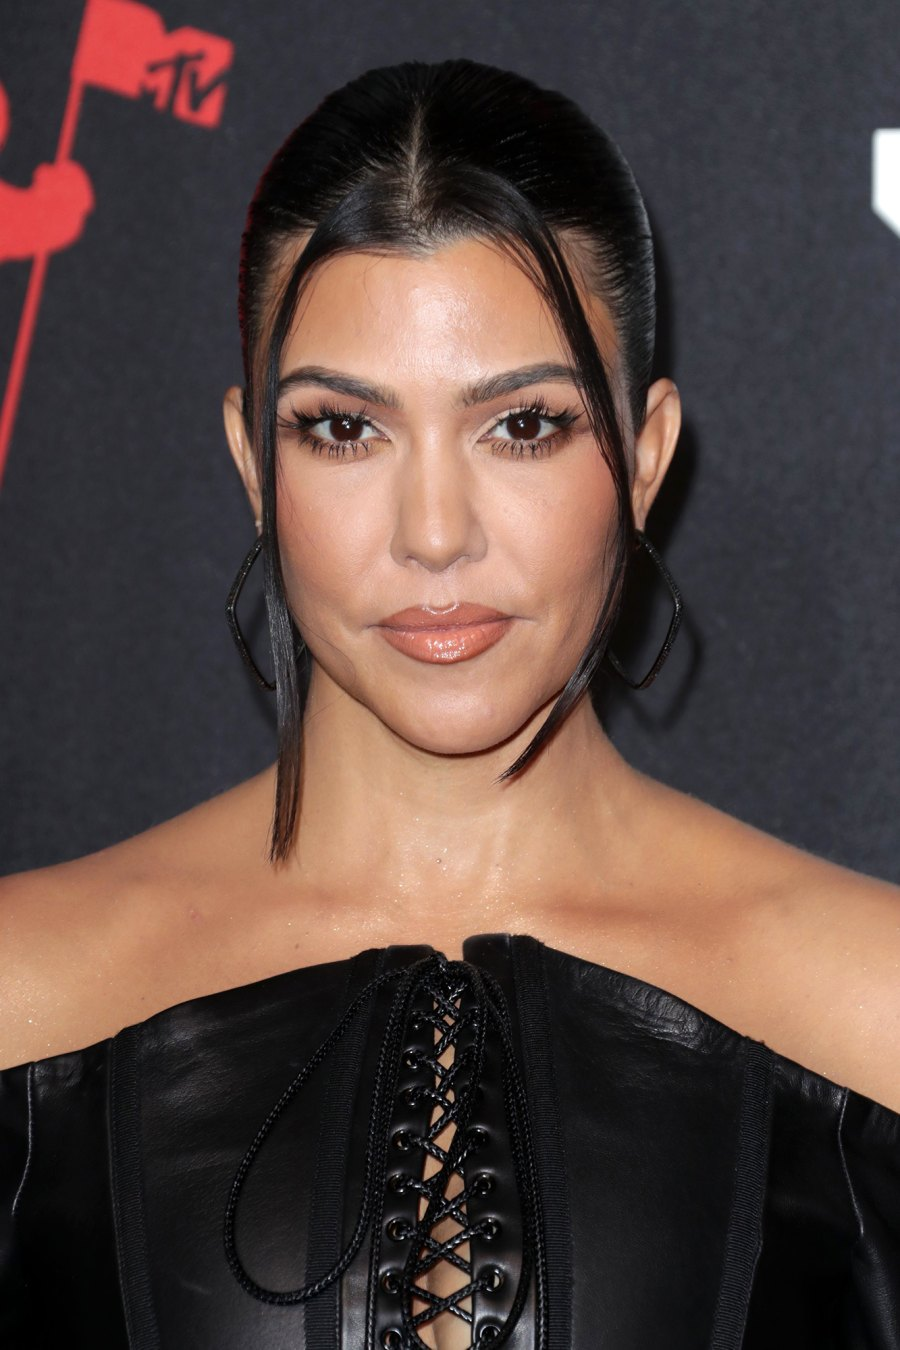 Kim Kardashian's Family Reacts to Her 'SNL' Roasting: Kourtney Kardashian, Kris Jenner and More Respond